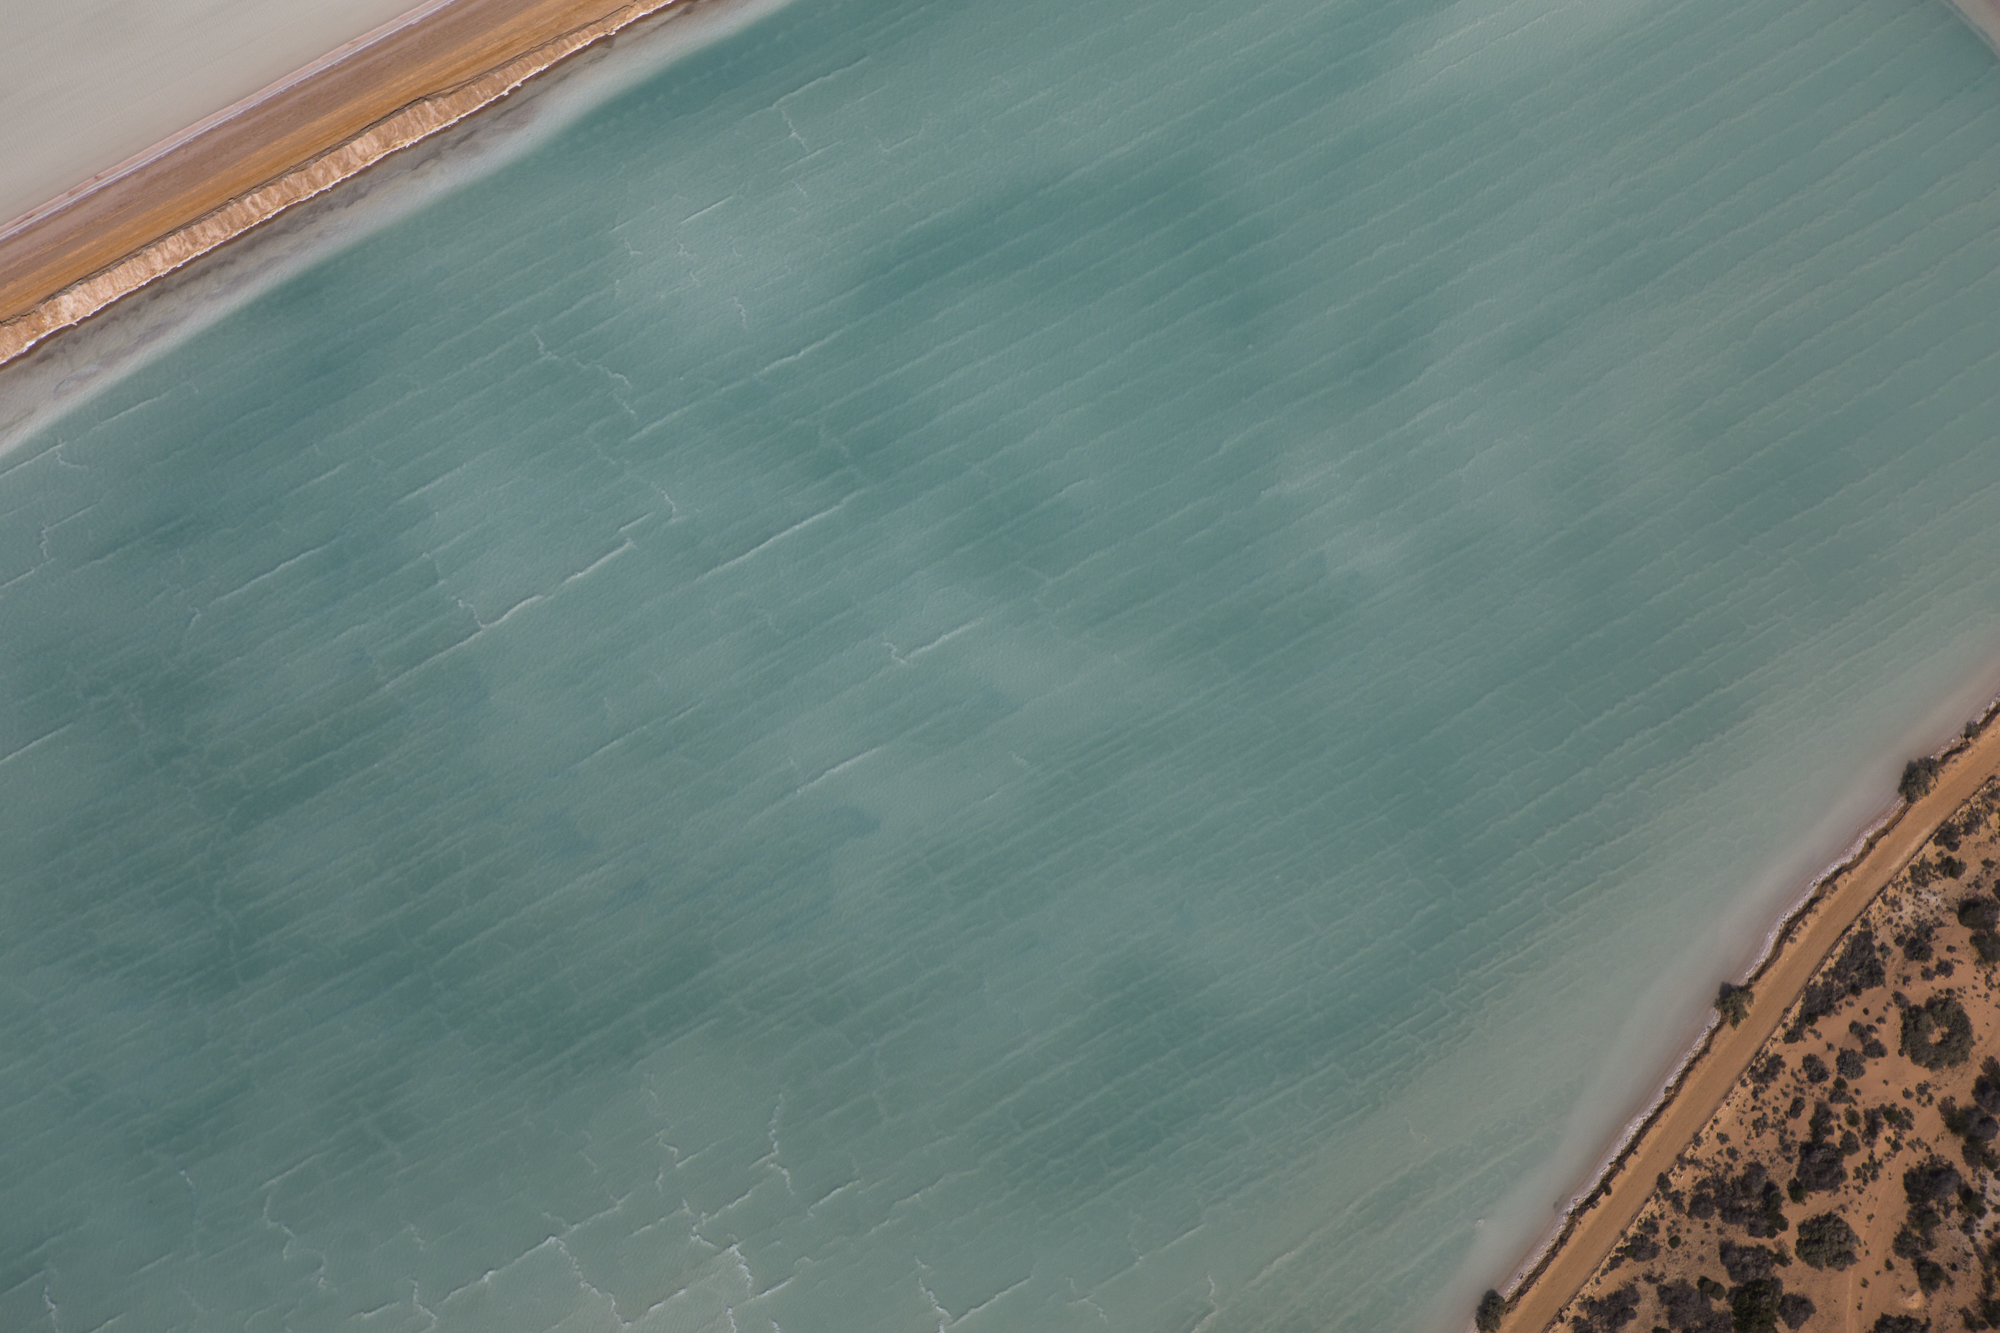 Salt Farm Evaporation Pool #7